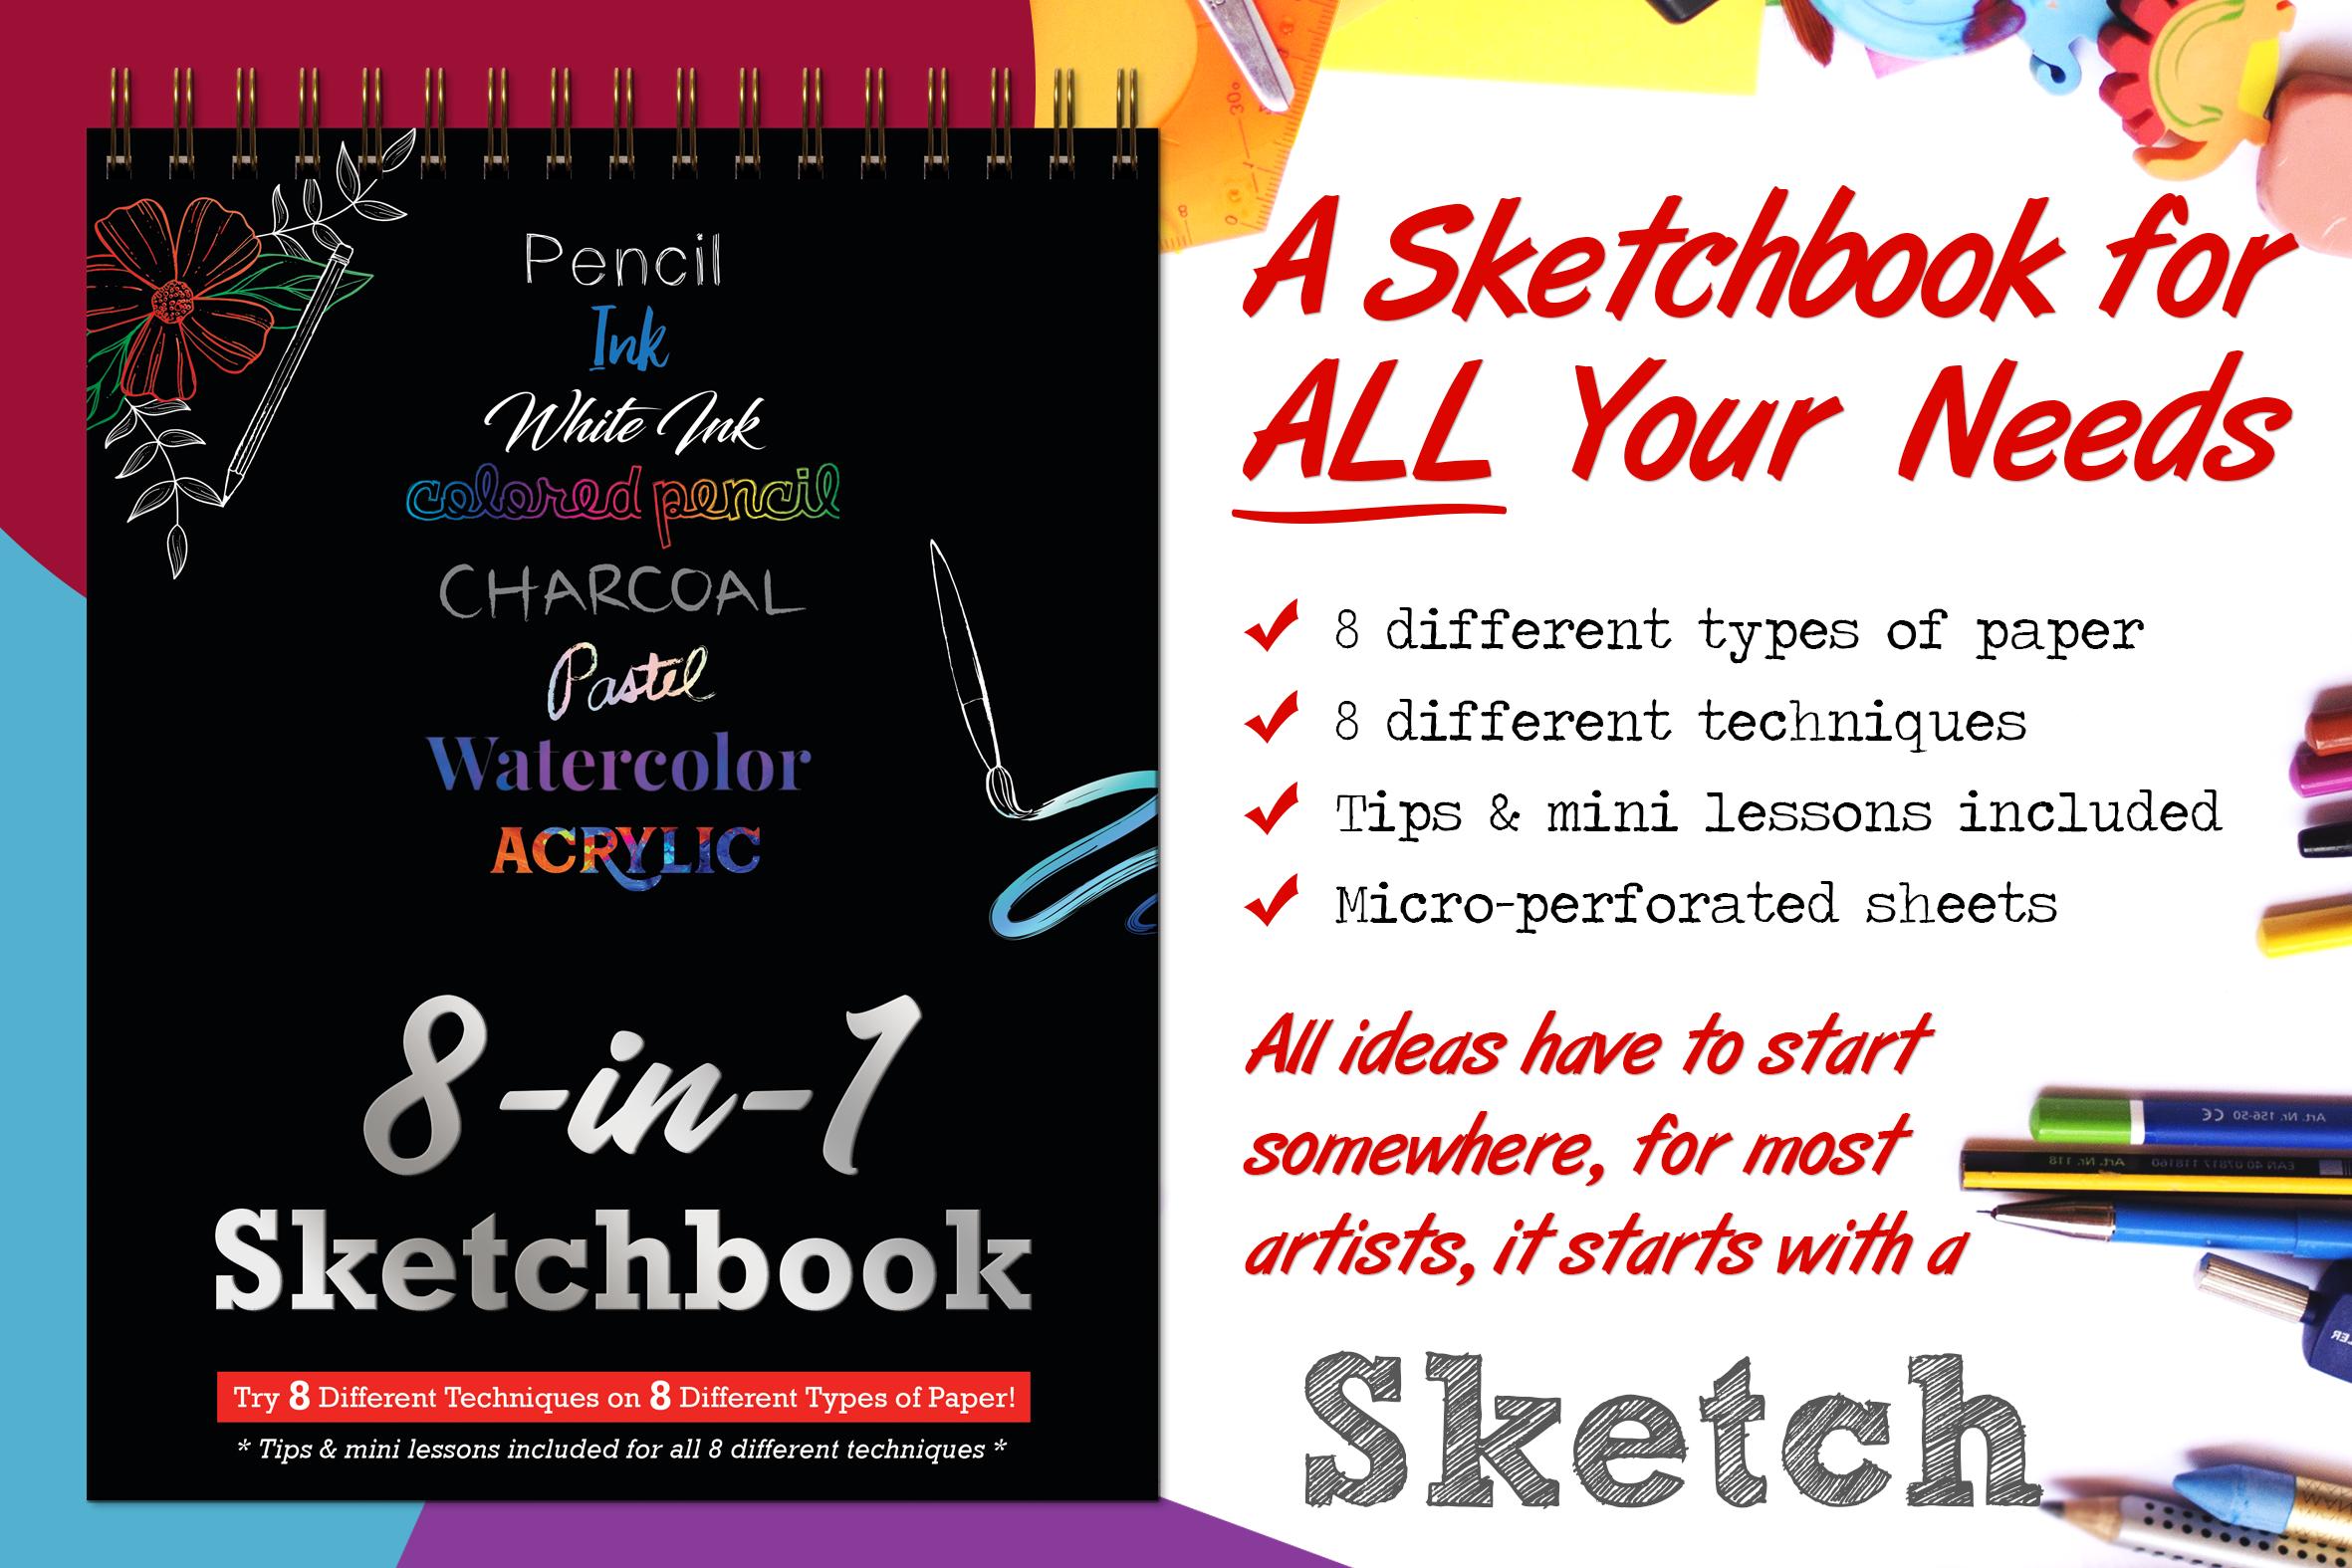 8-in-1 Sketchbook